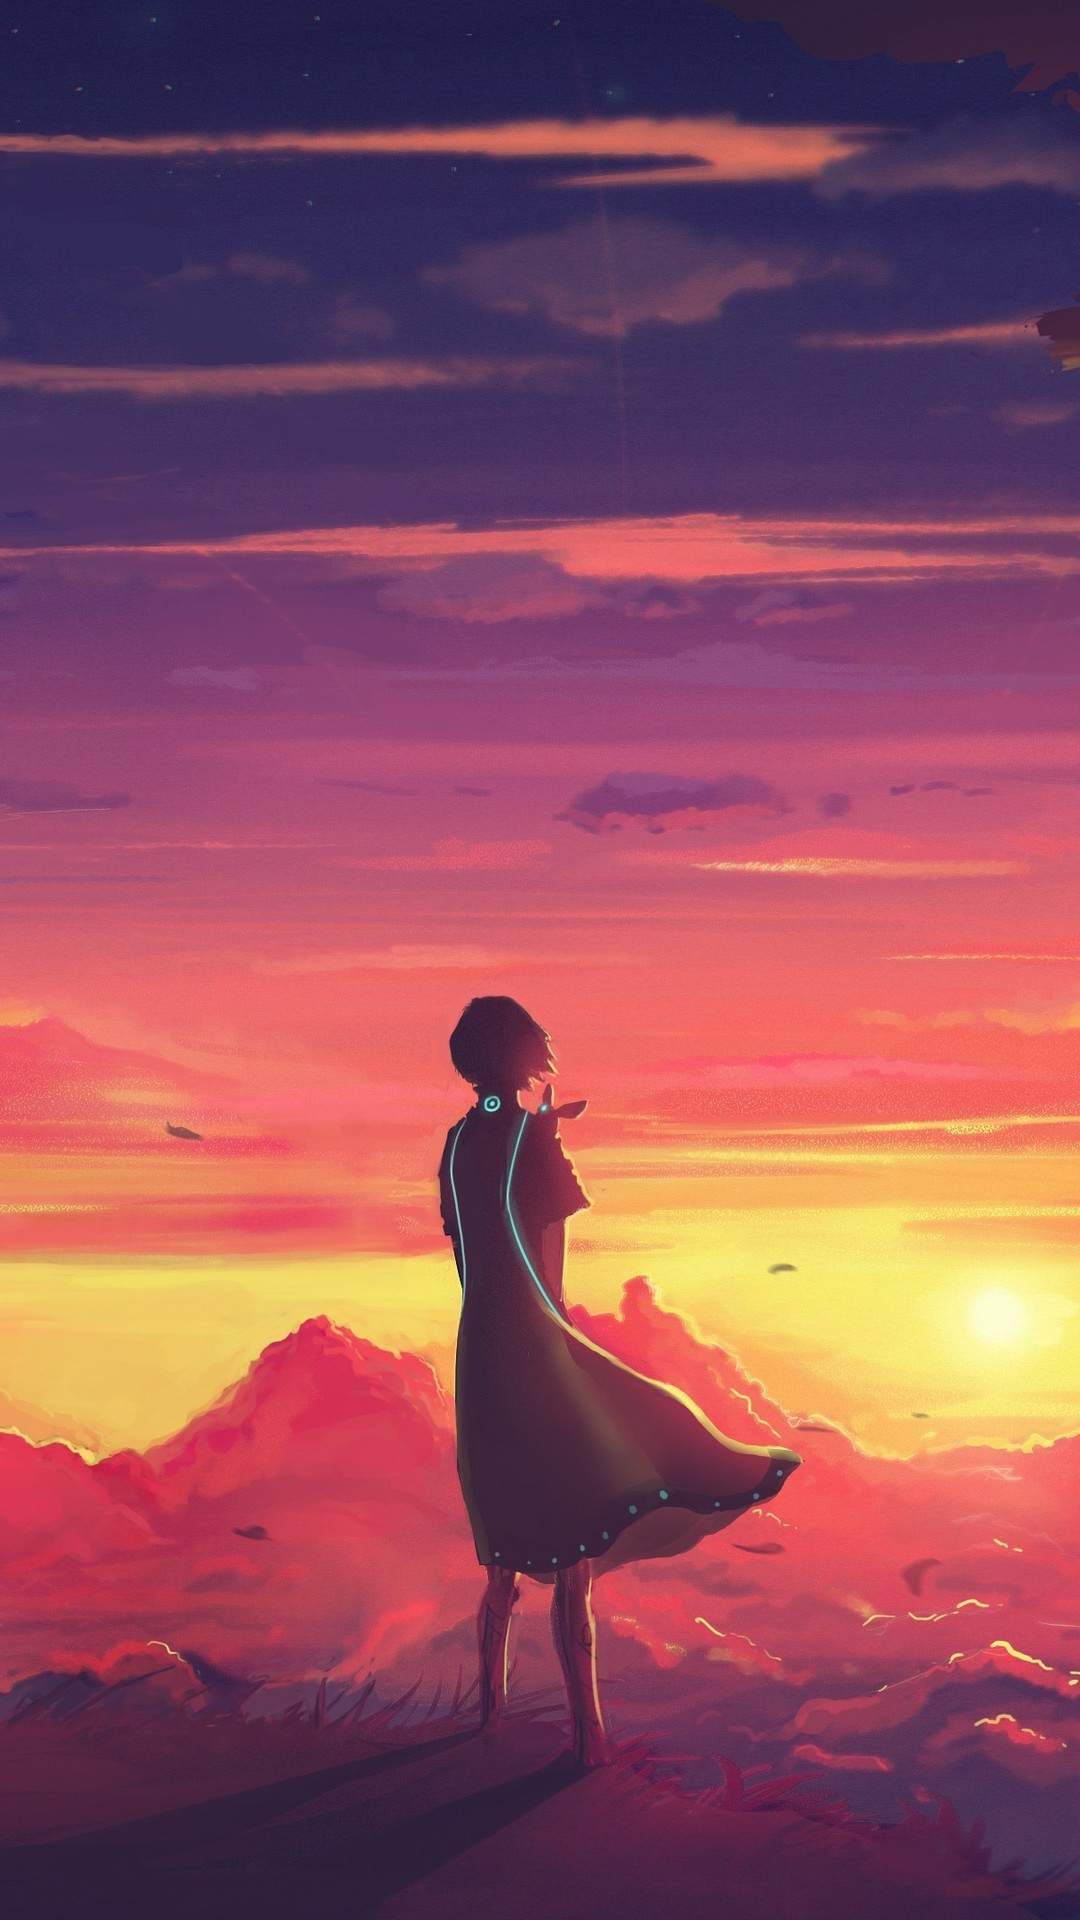 Future Anime iPhone Wallpaper